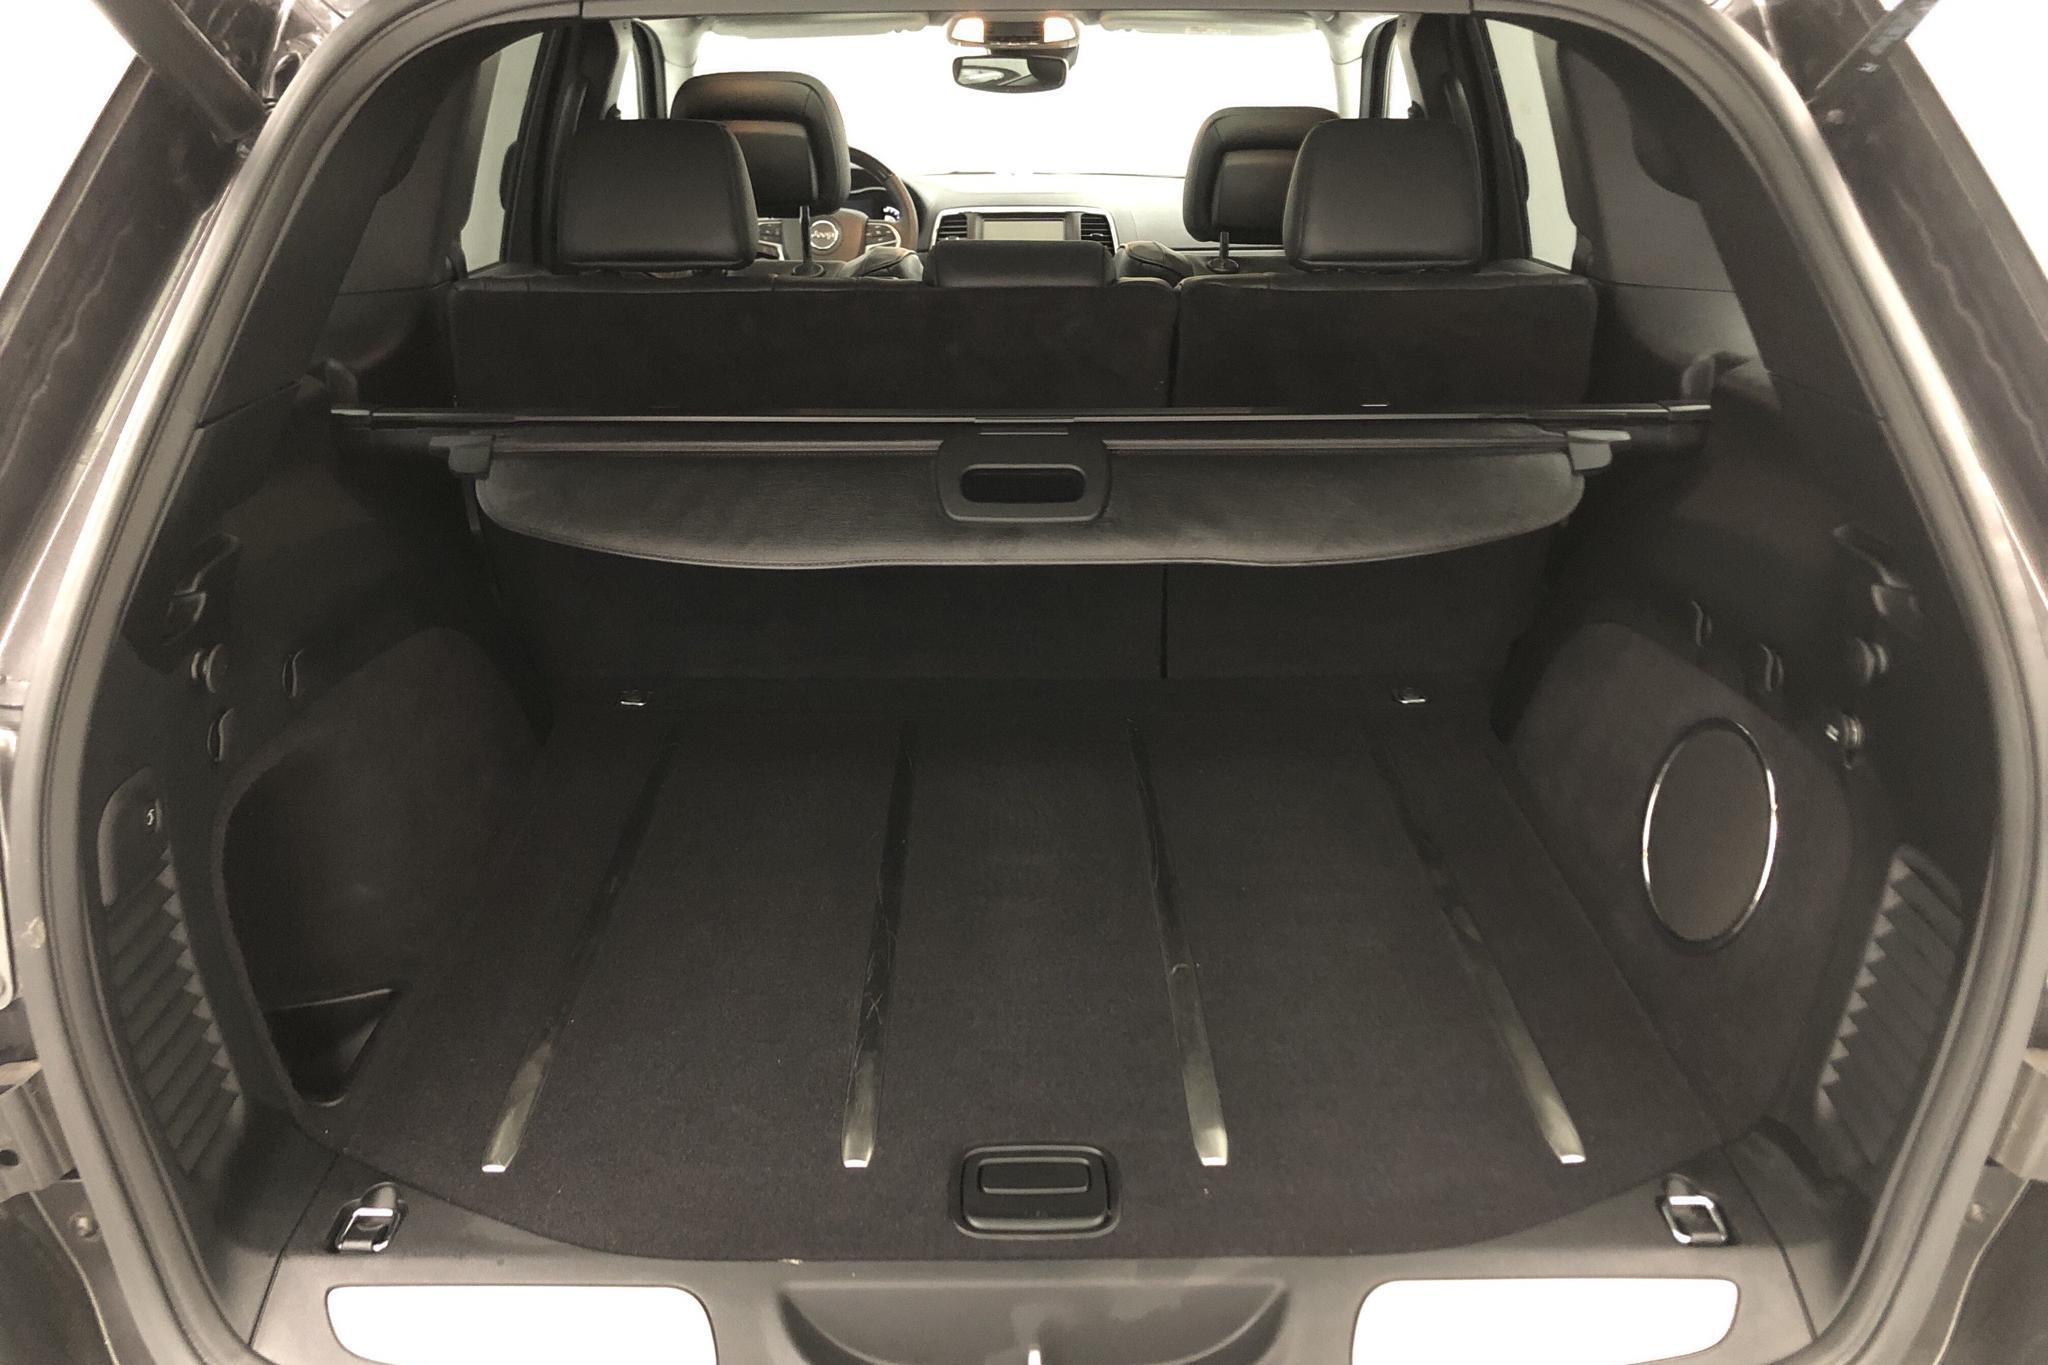 Jeep Grand Cherokee 3.0 CRD V6 AWD (250hk) - 2 921 mil - Automat - grå - 2017